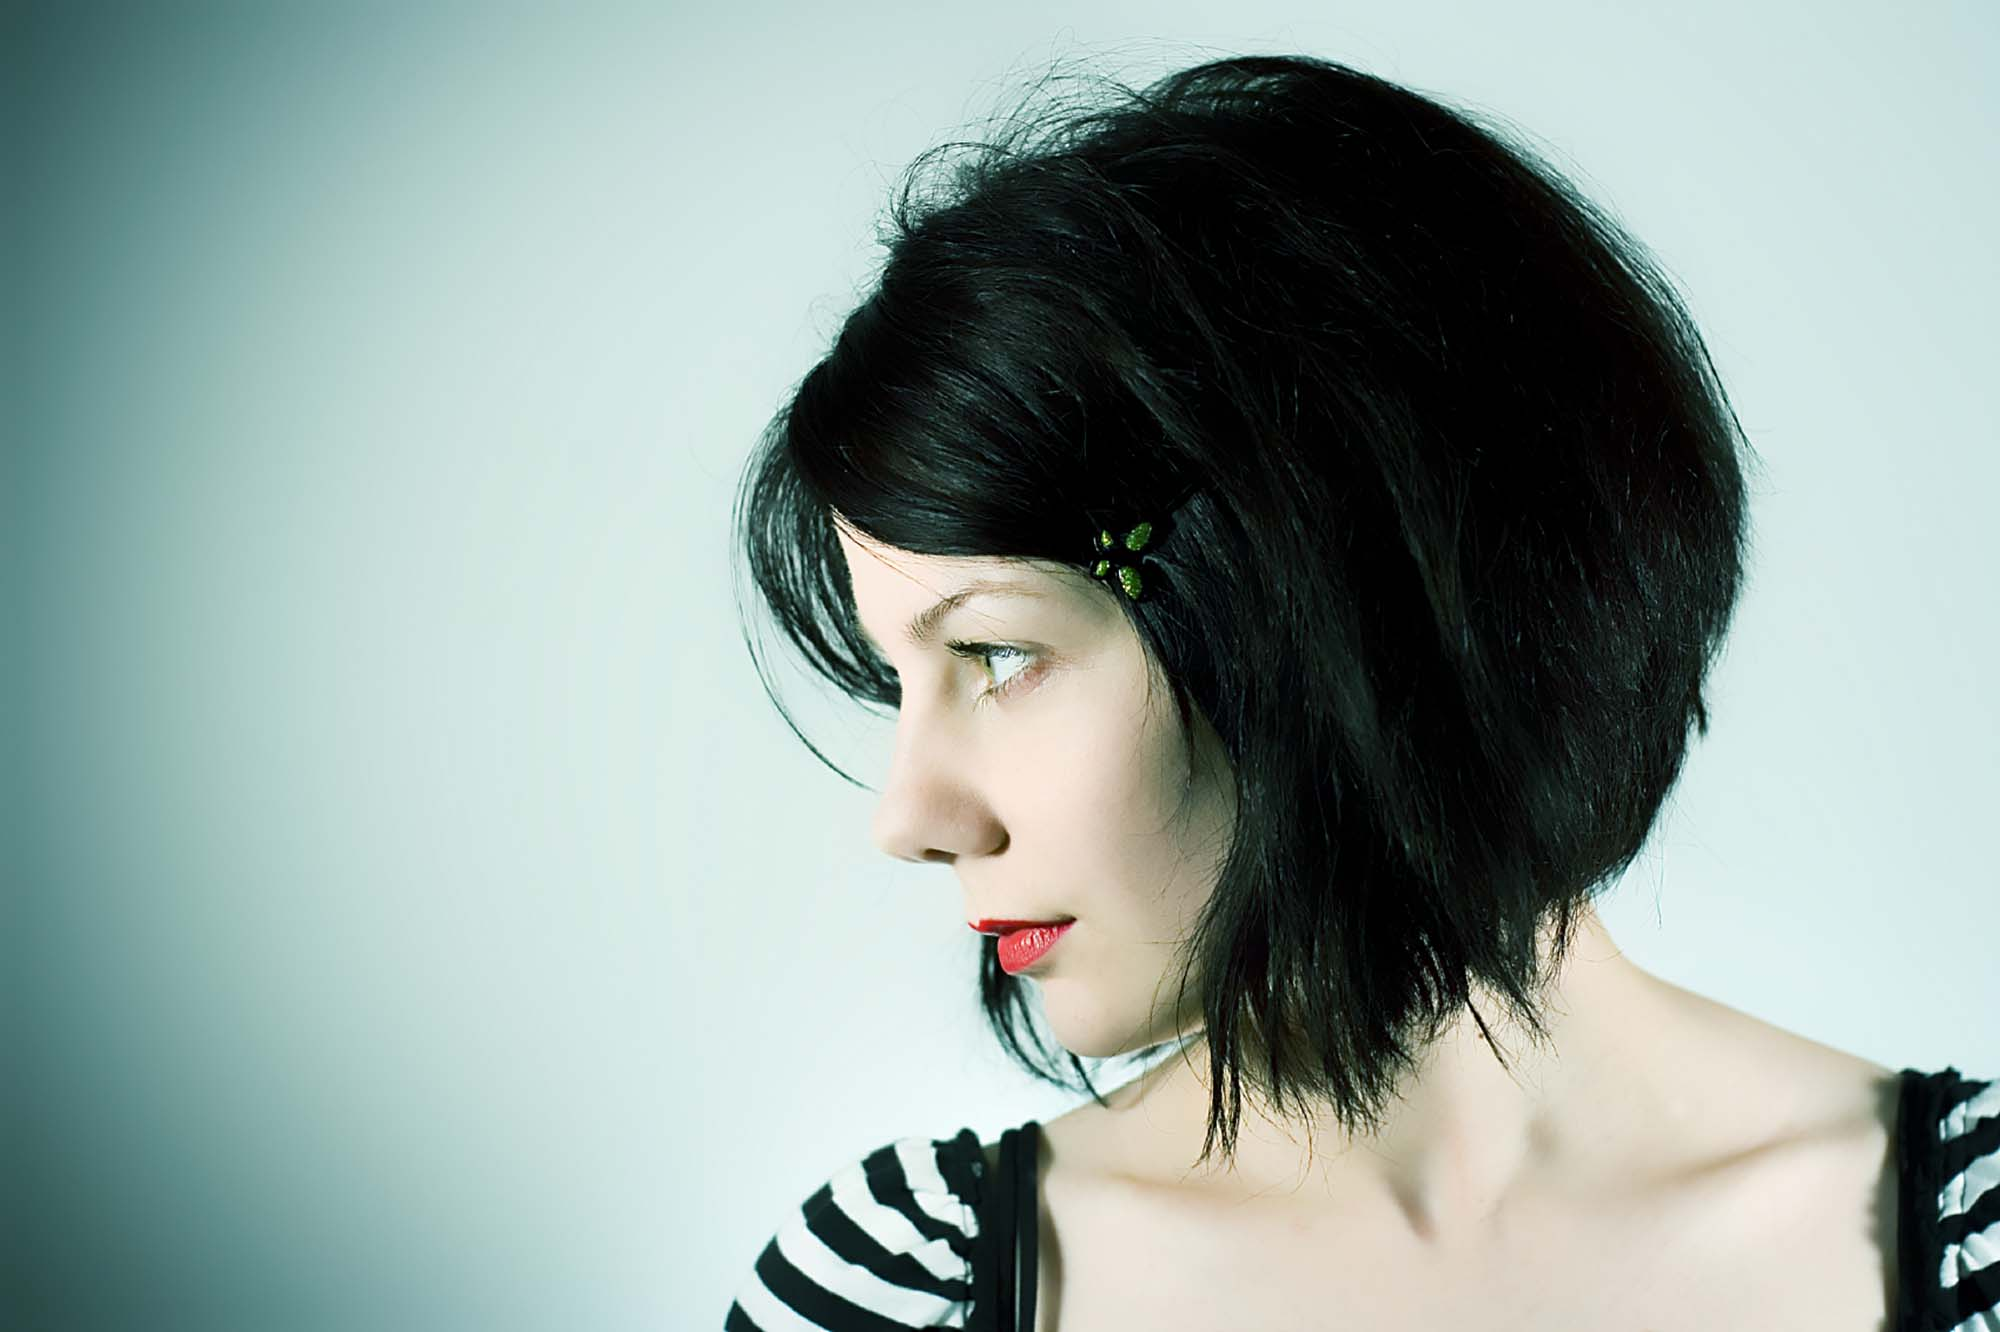 modelo branca com cabelo liso curto preto